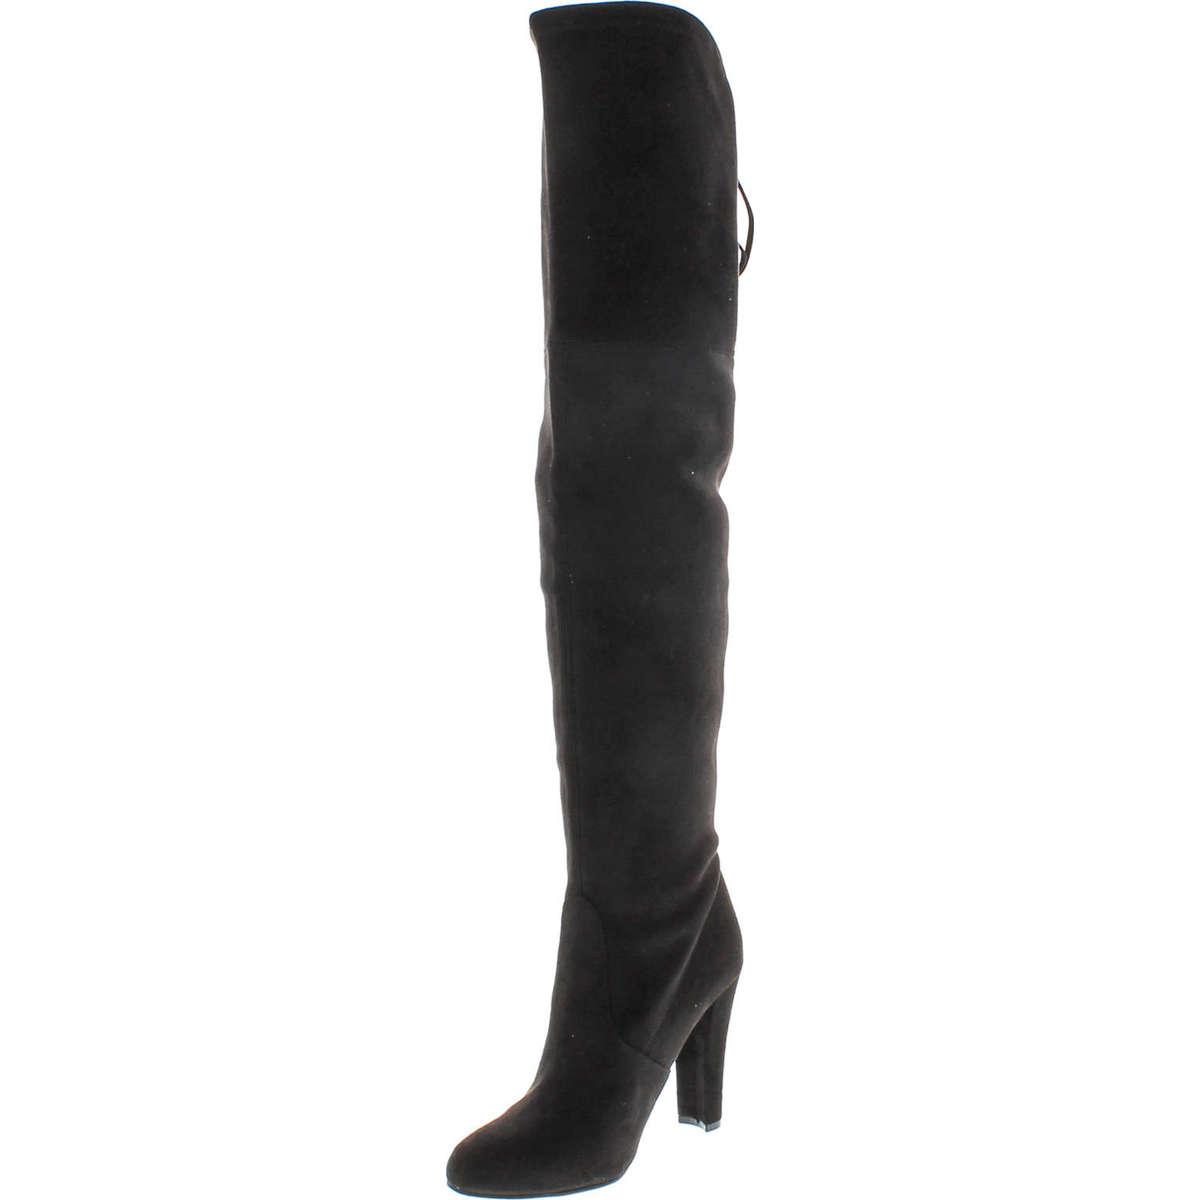 Mantenimiento Santuario corona  Steve Madden Women's Gorgeous Winter Boot, Size 10 715924023614 | eBay